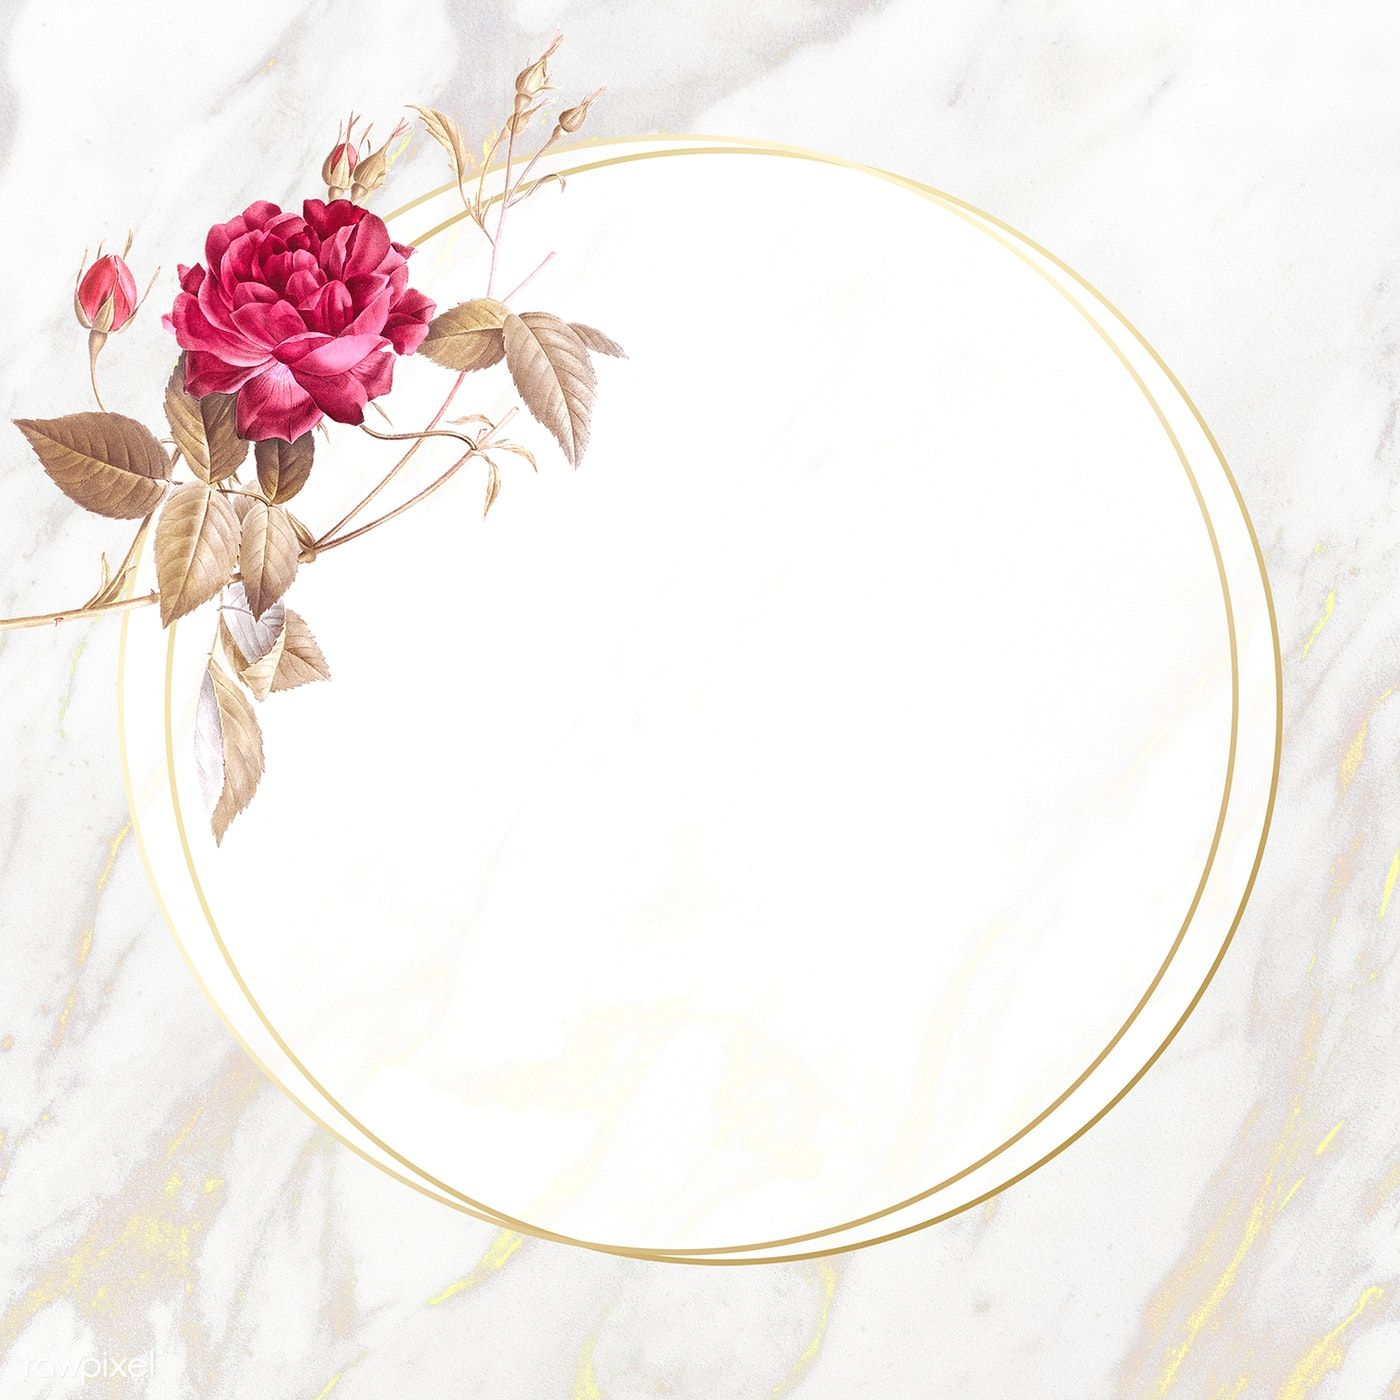 Round Flower Frame On Beige Marble Background Illustration Premium Image By Rawpixel Com Adj H Flower Background Iphone Flower Frame Floral Border Design